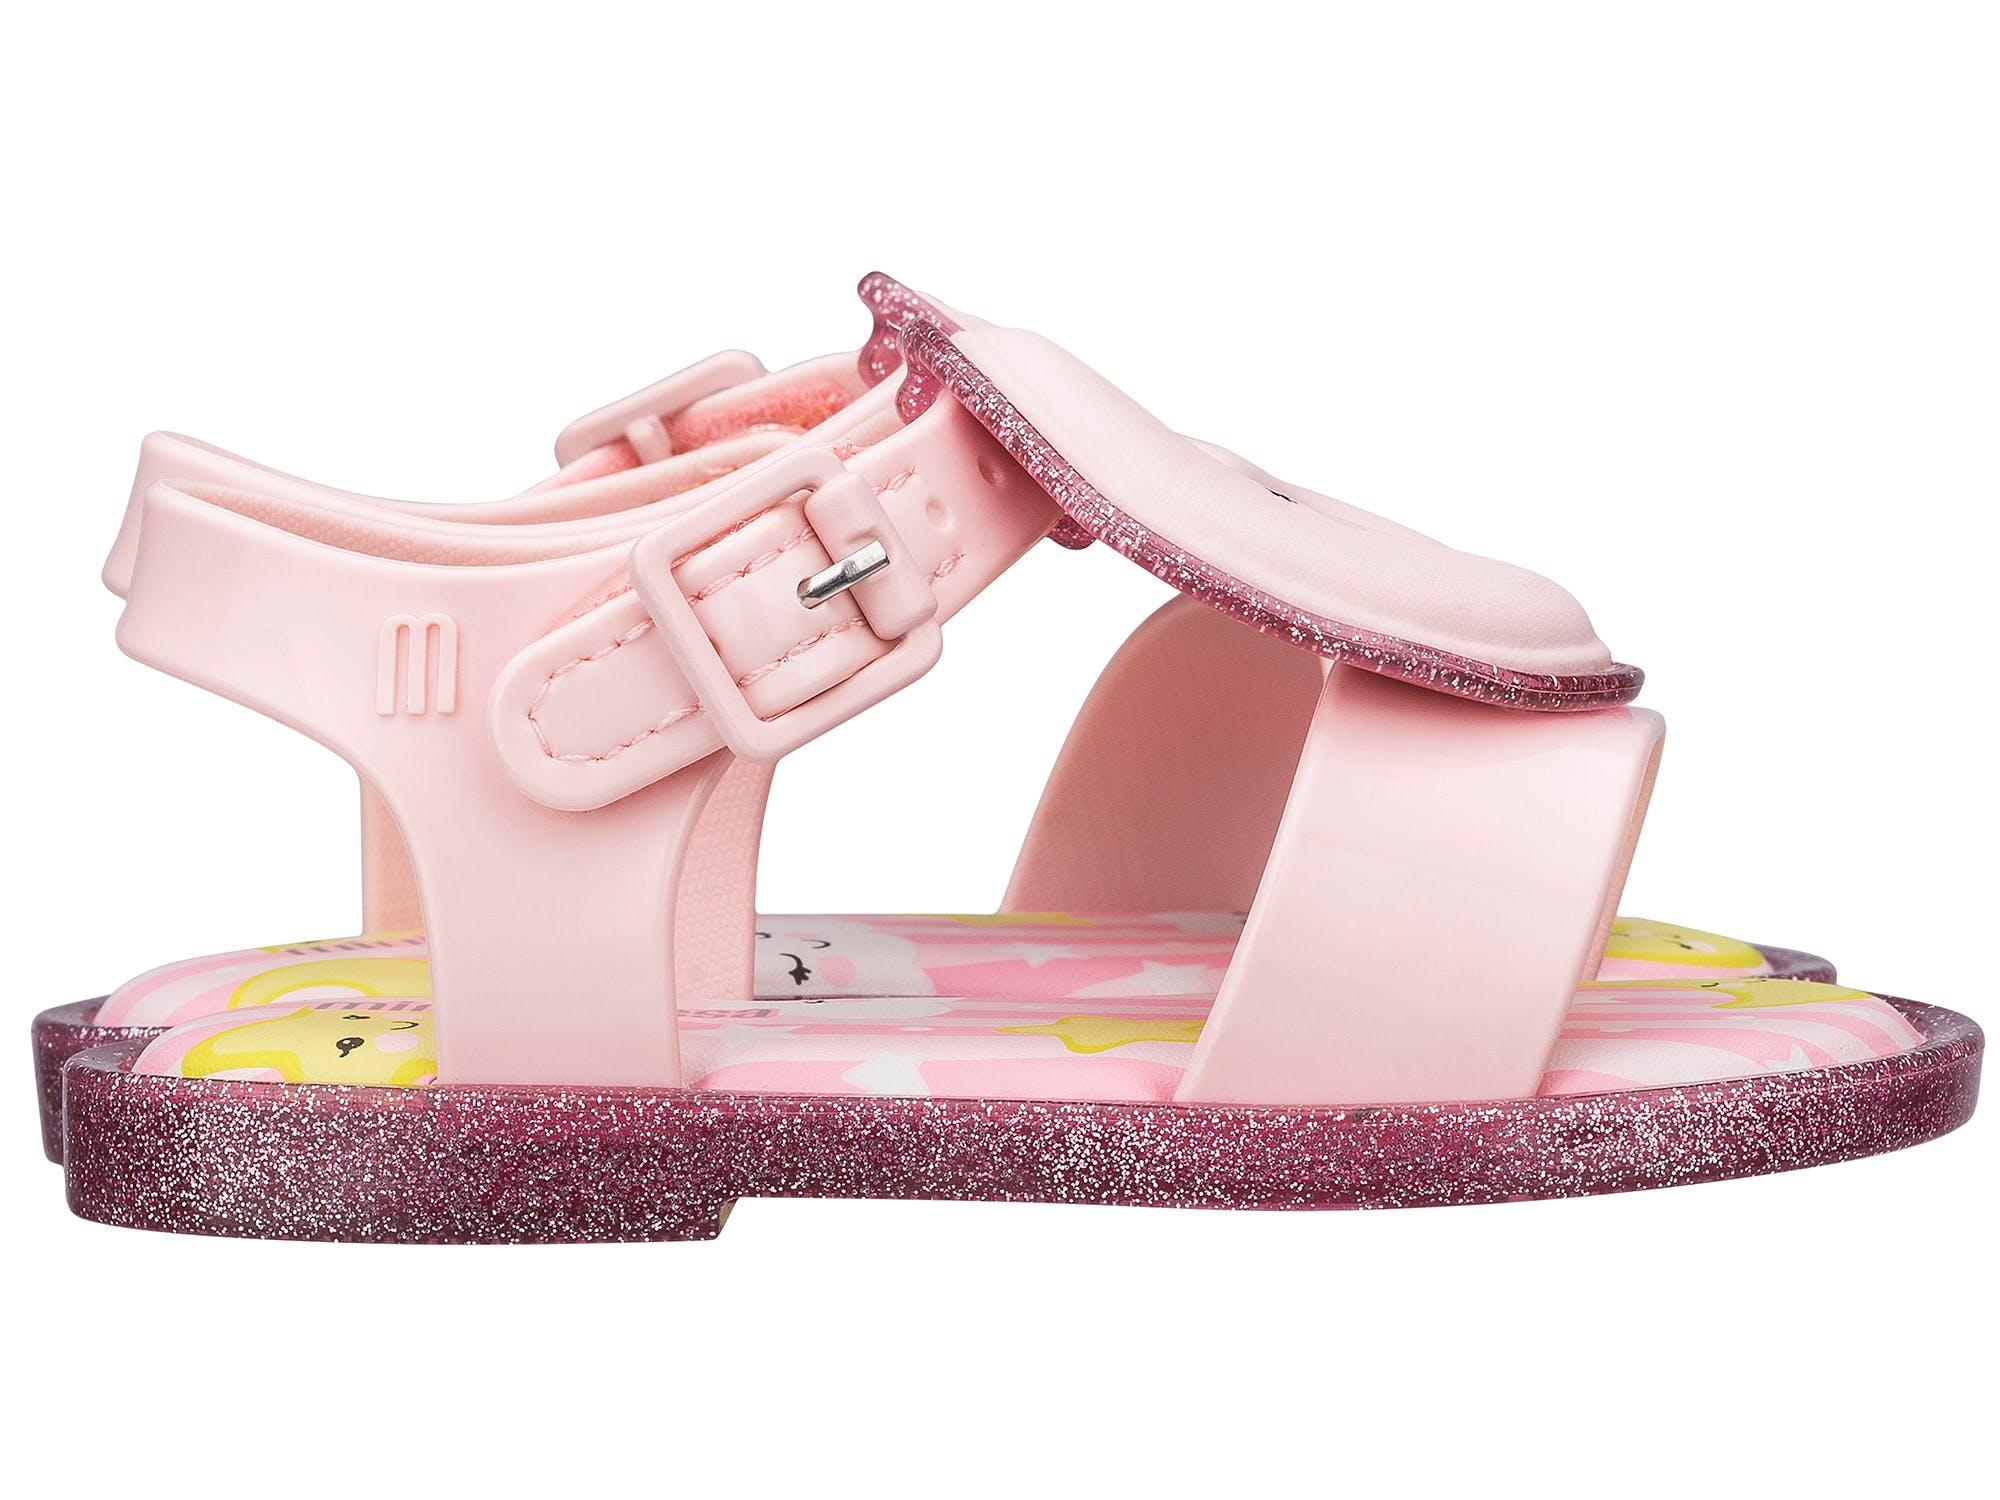 Mini Melissa Mar Sandal Sweet Dreams Rosa Rosa Glitter